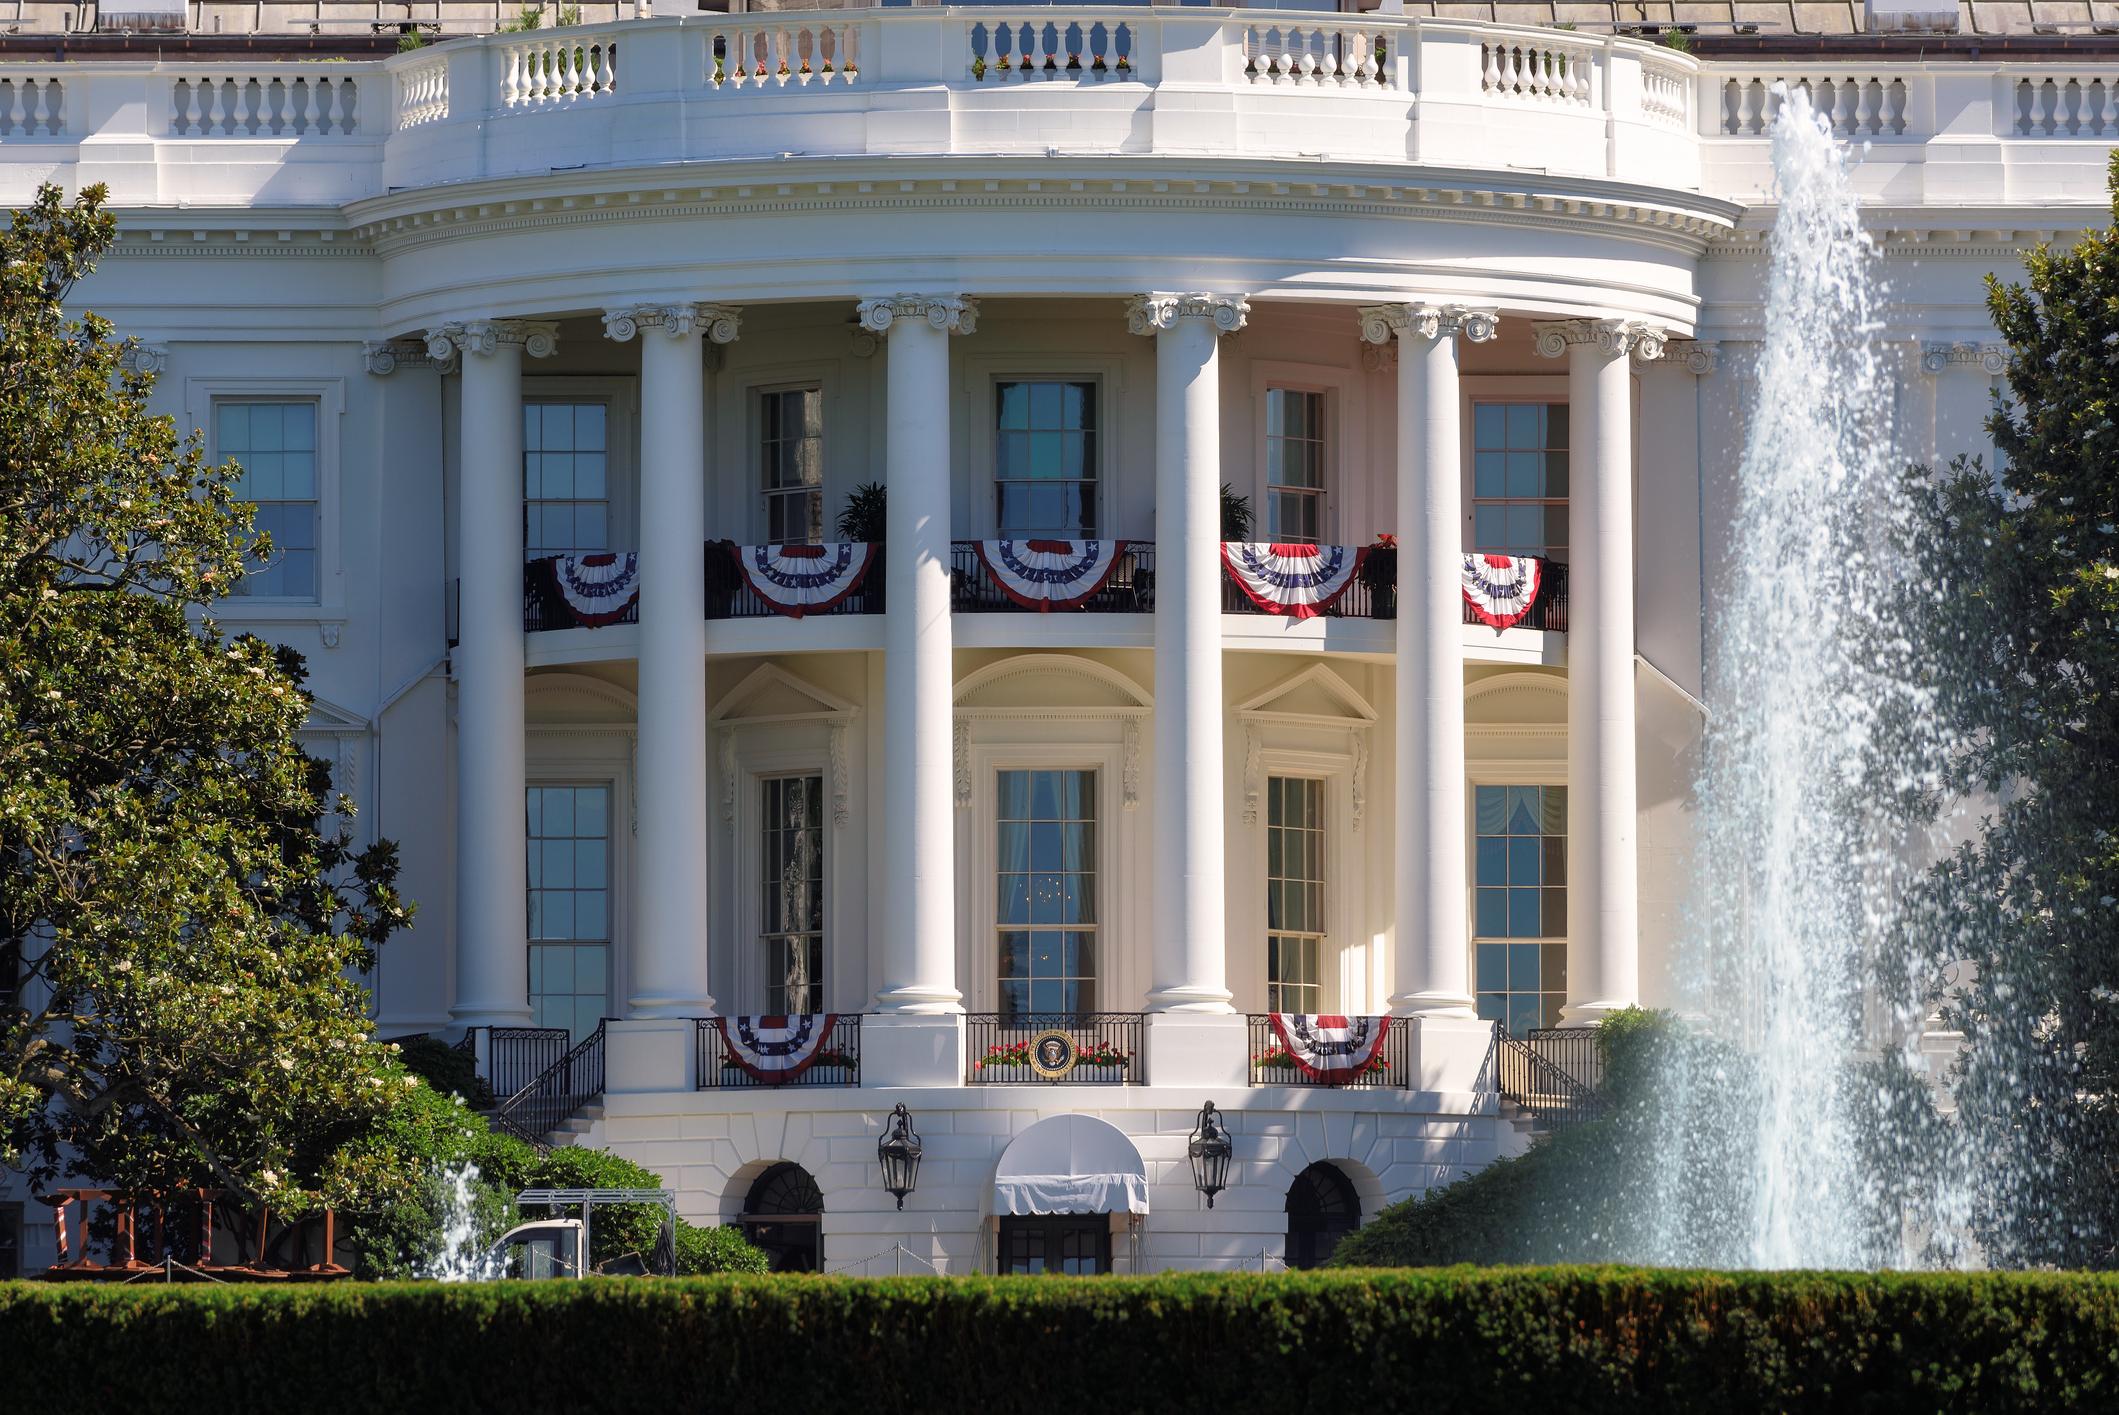 White House, Washington, D.C., federal information technology, IT